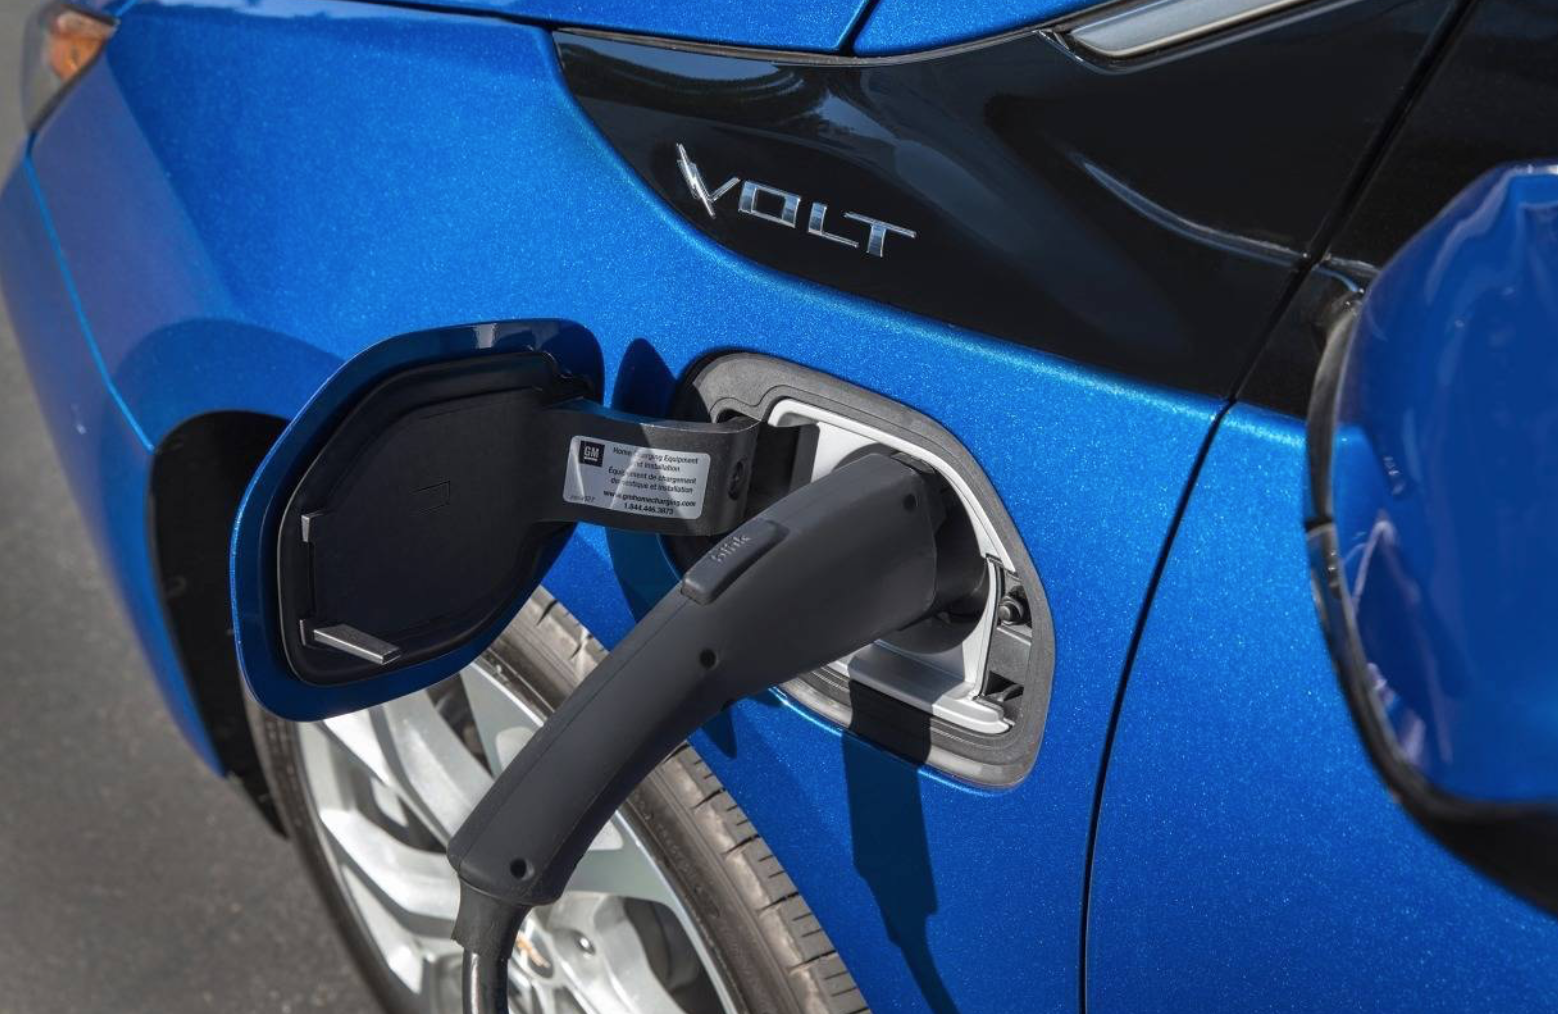 2017 Chevrolet Volt Charger